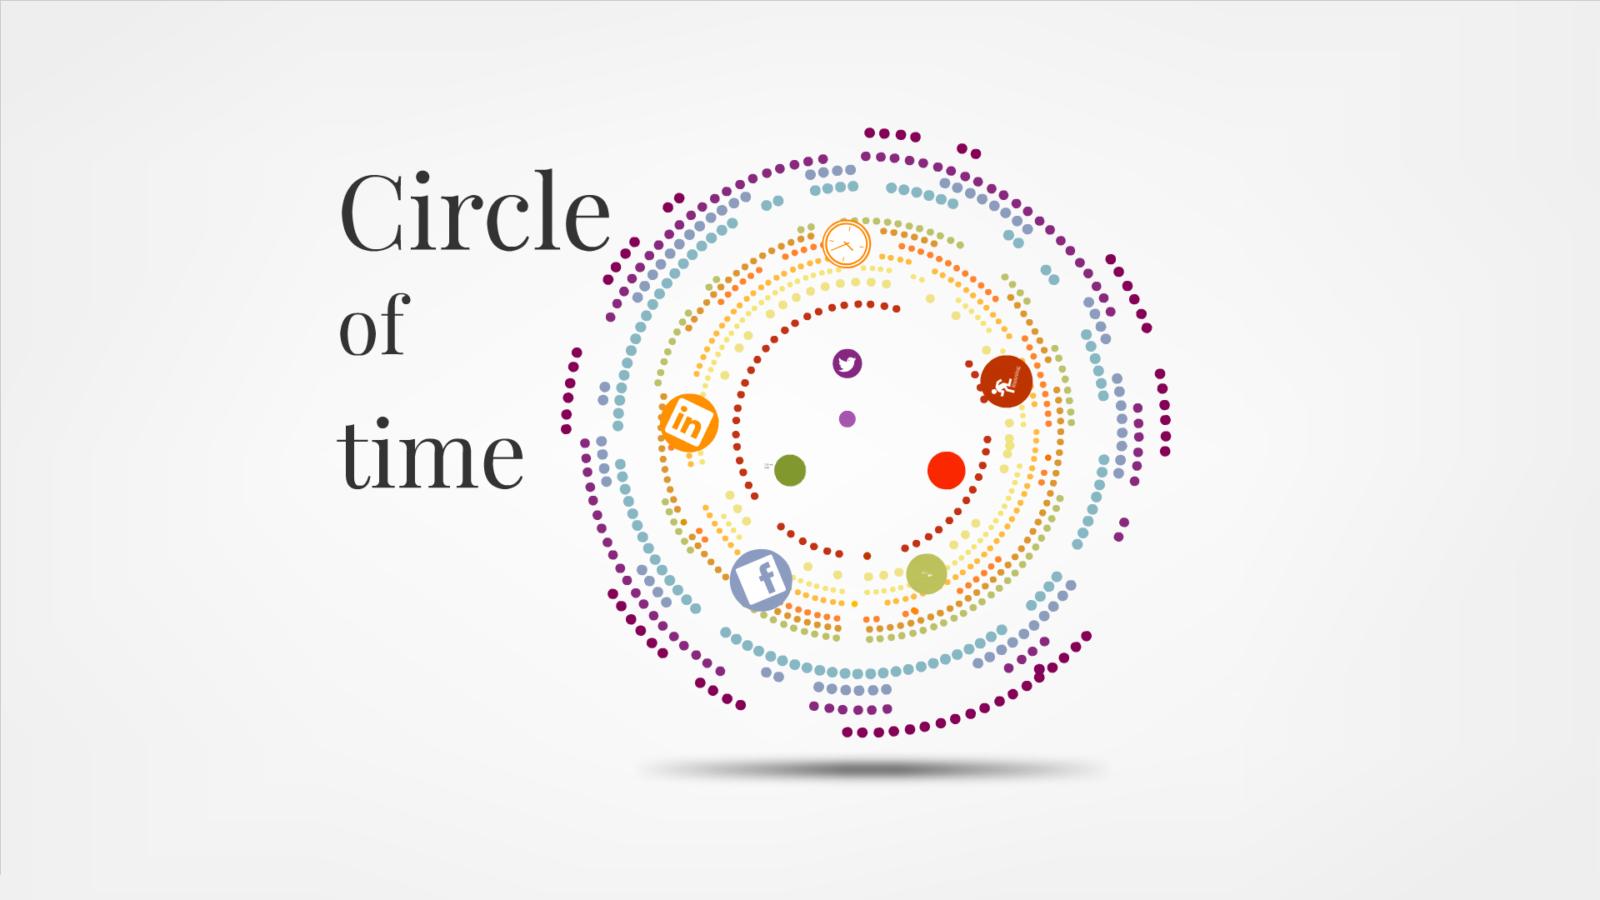 circle of time prezi template preziland. Black Bedroom Furniture Sets. Home Design Ideas